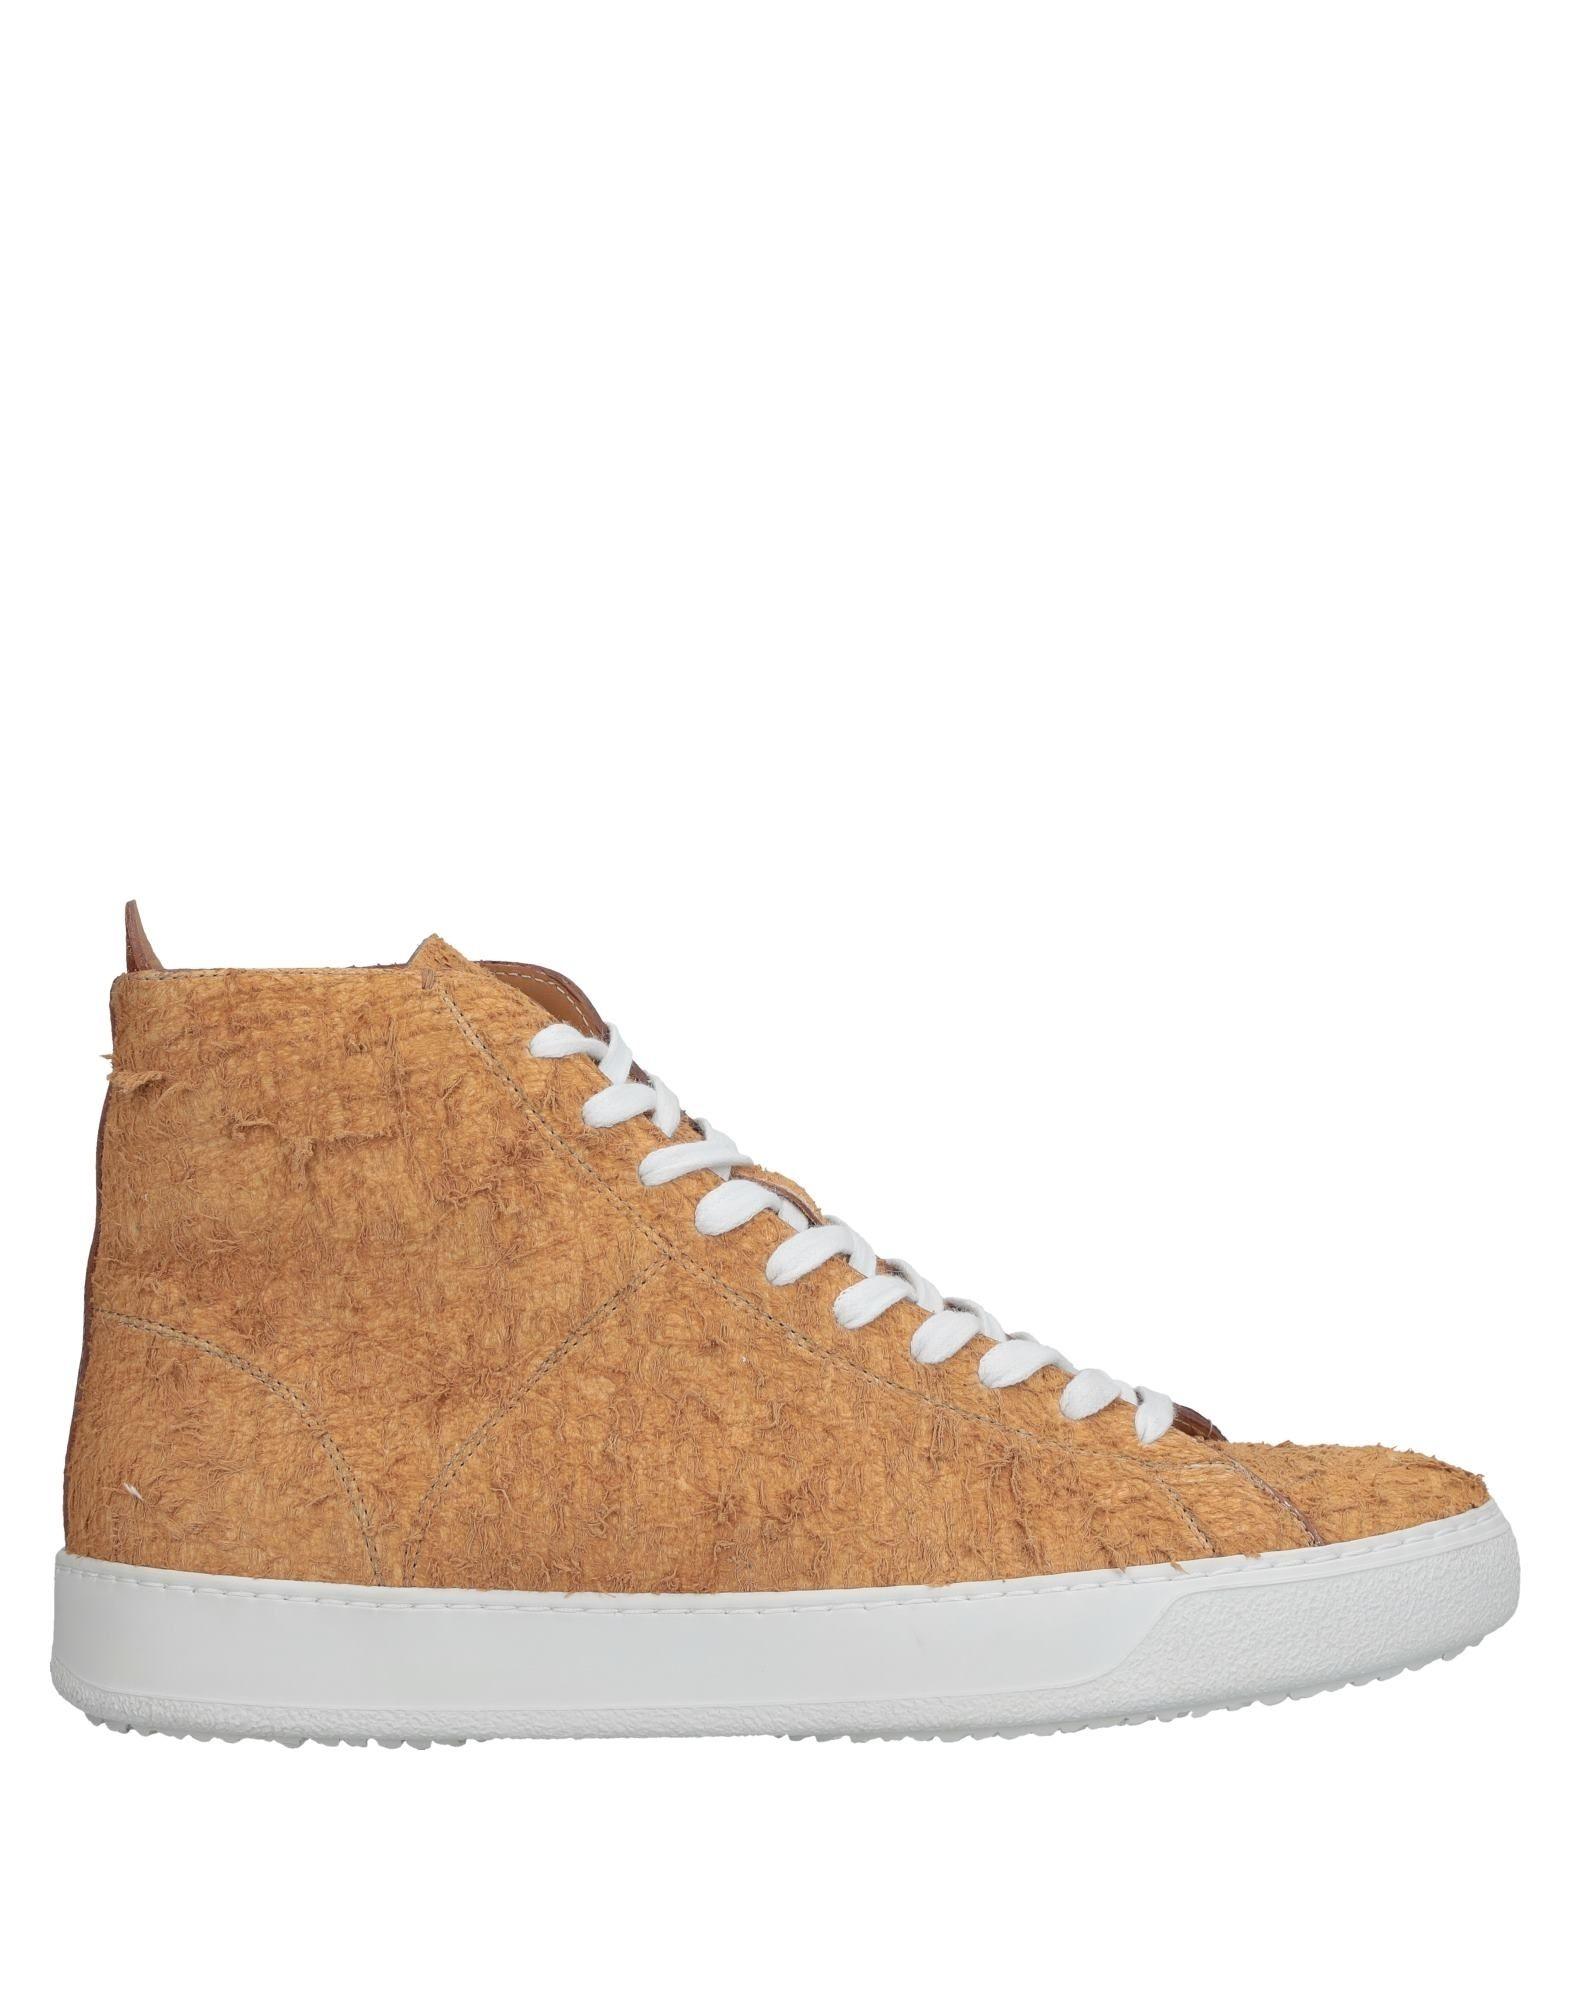 Vivienne Westwood Sneakers Herren  11520261NX Gute Qualität beliebte Schuhe